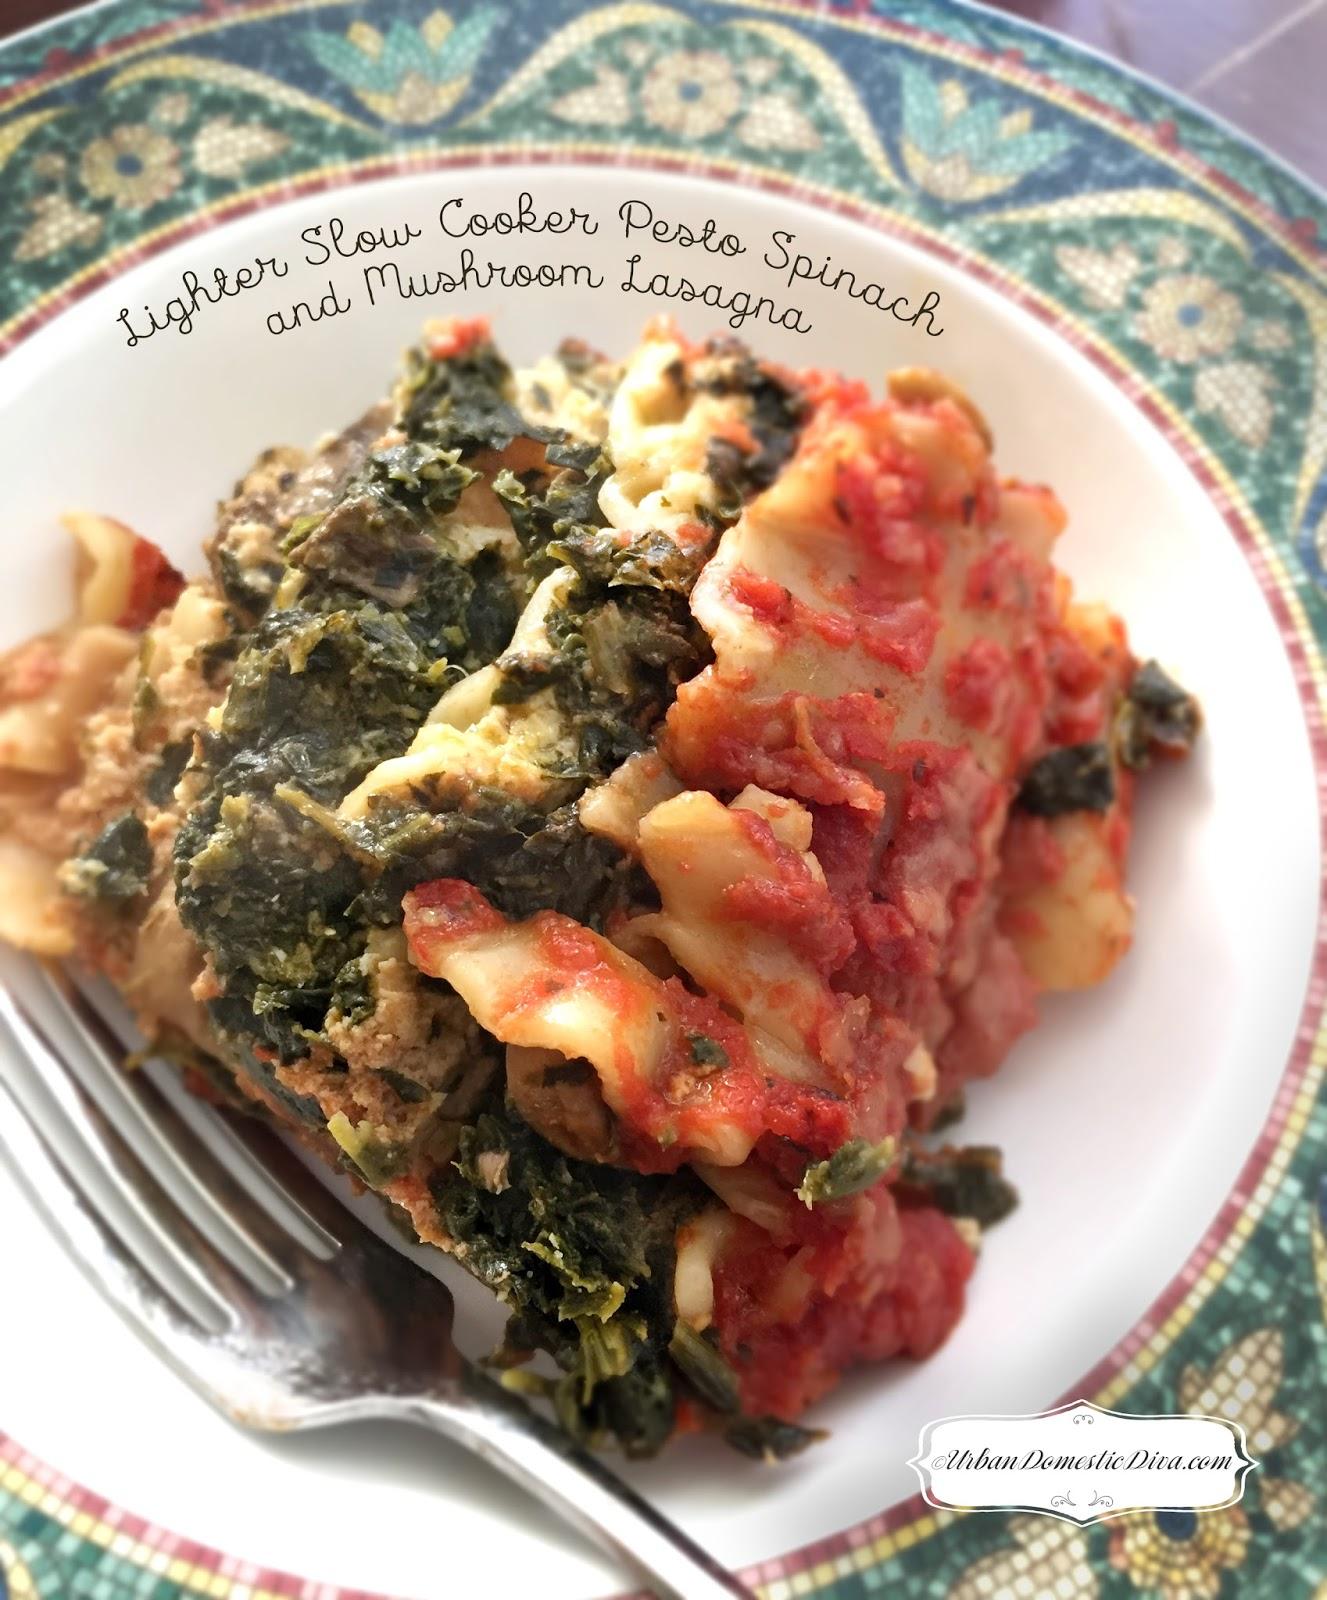 RECIPE: Lighter Slow Cooker Pesto Spinach and Mushroom Lasagna